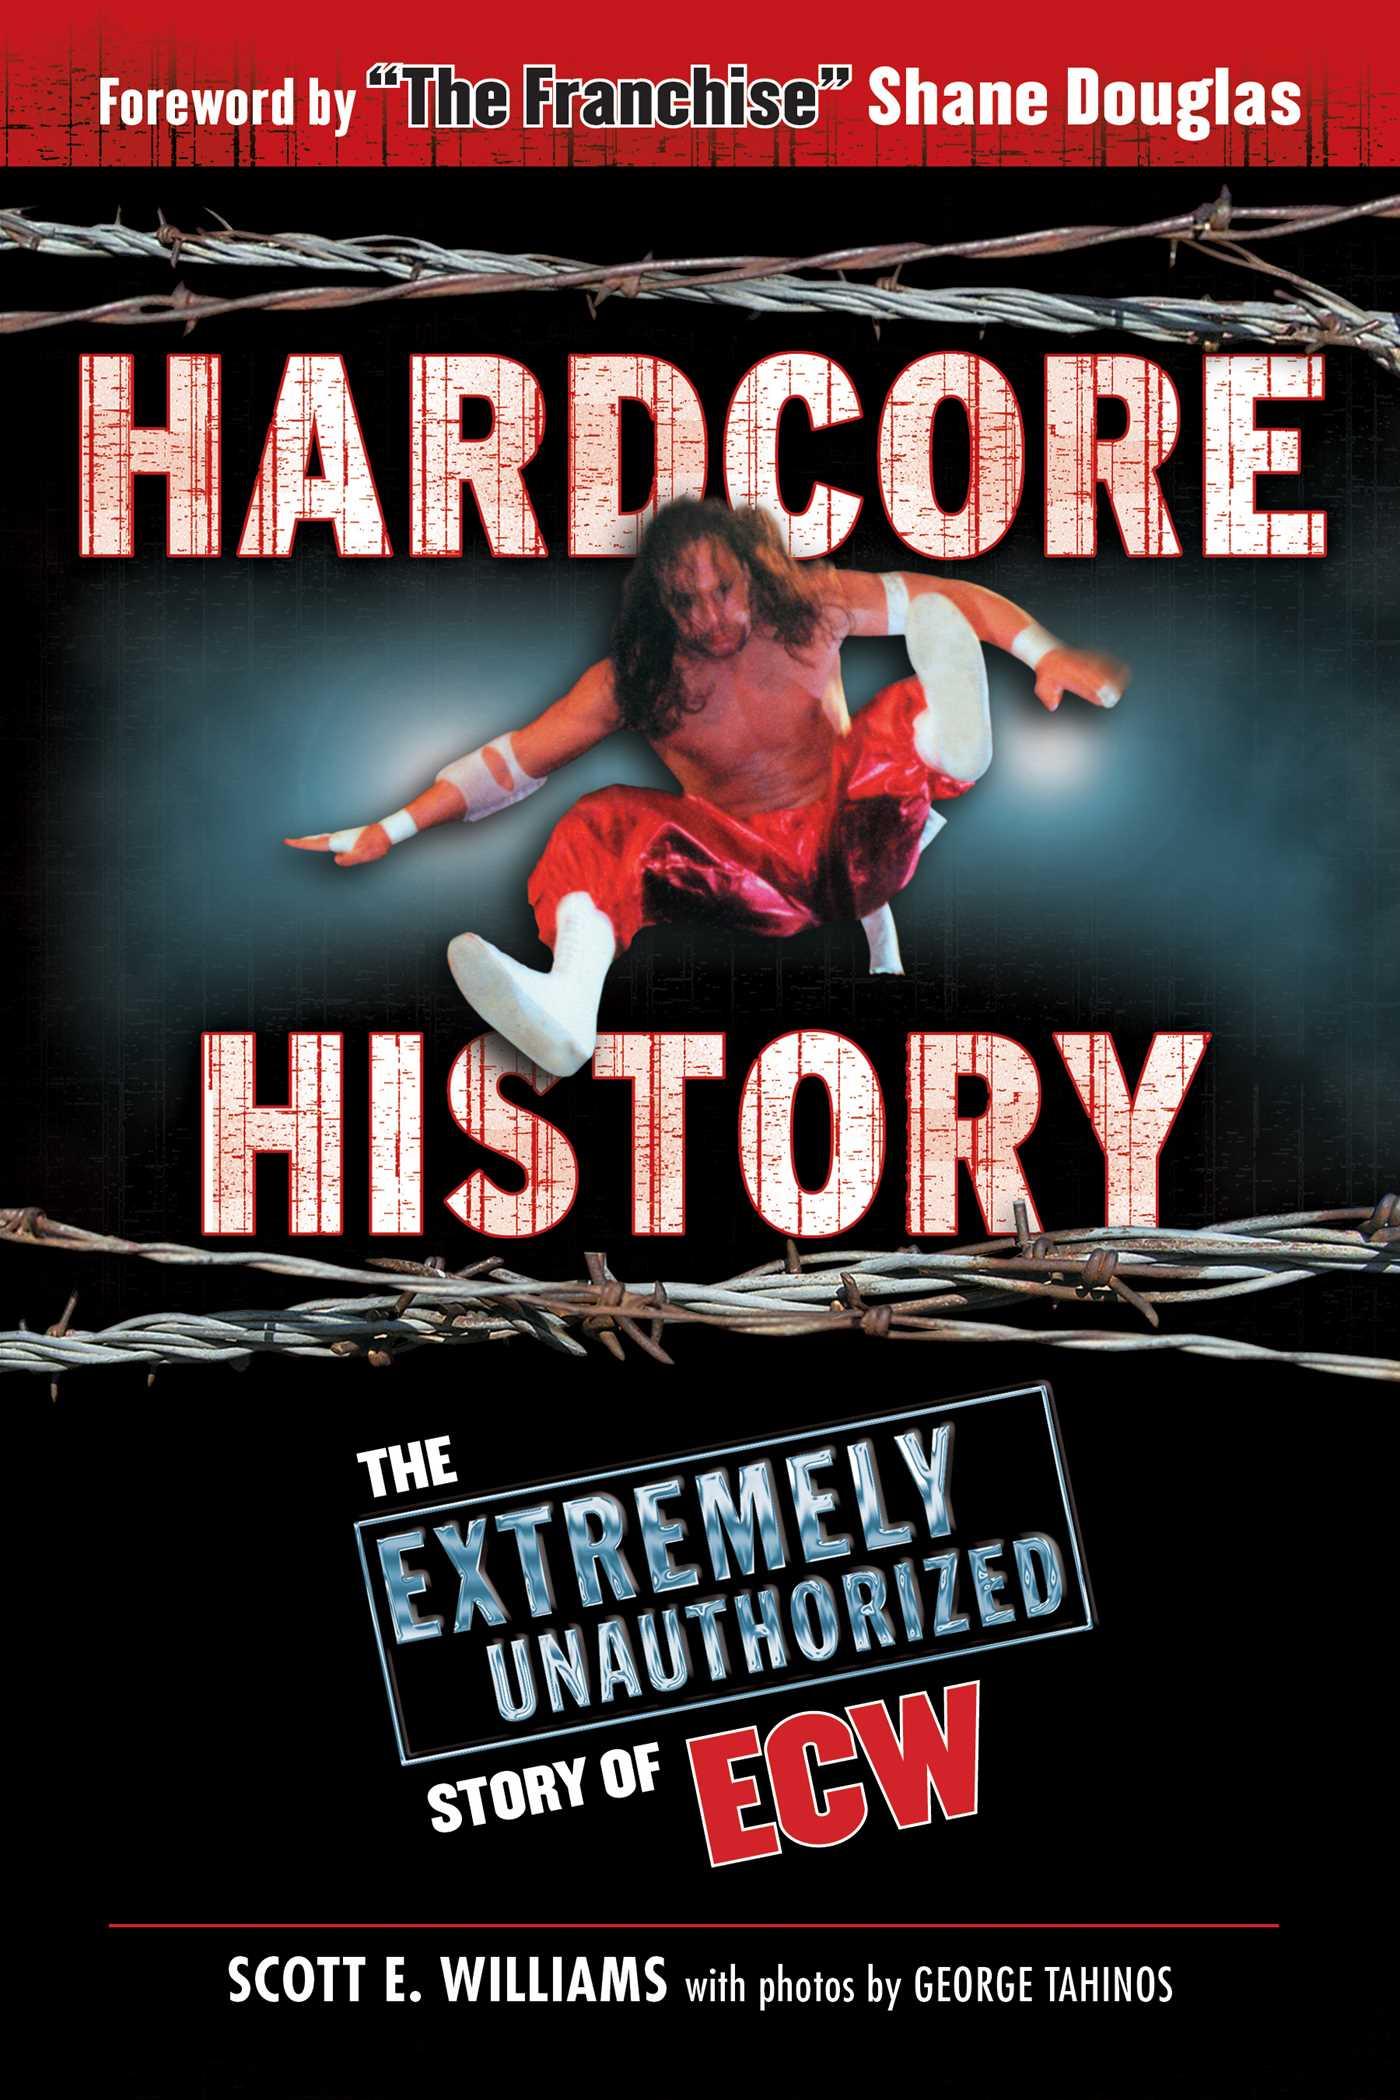 Hardcore history cody romness